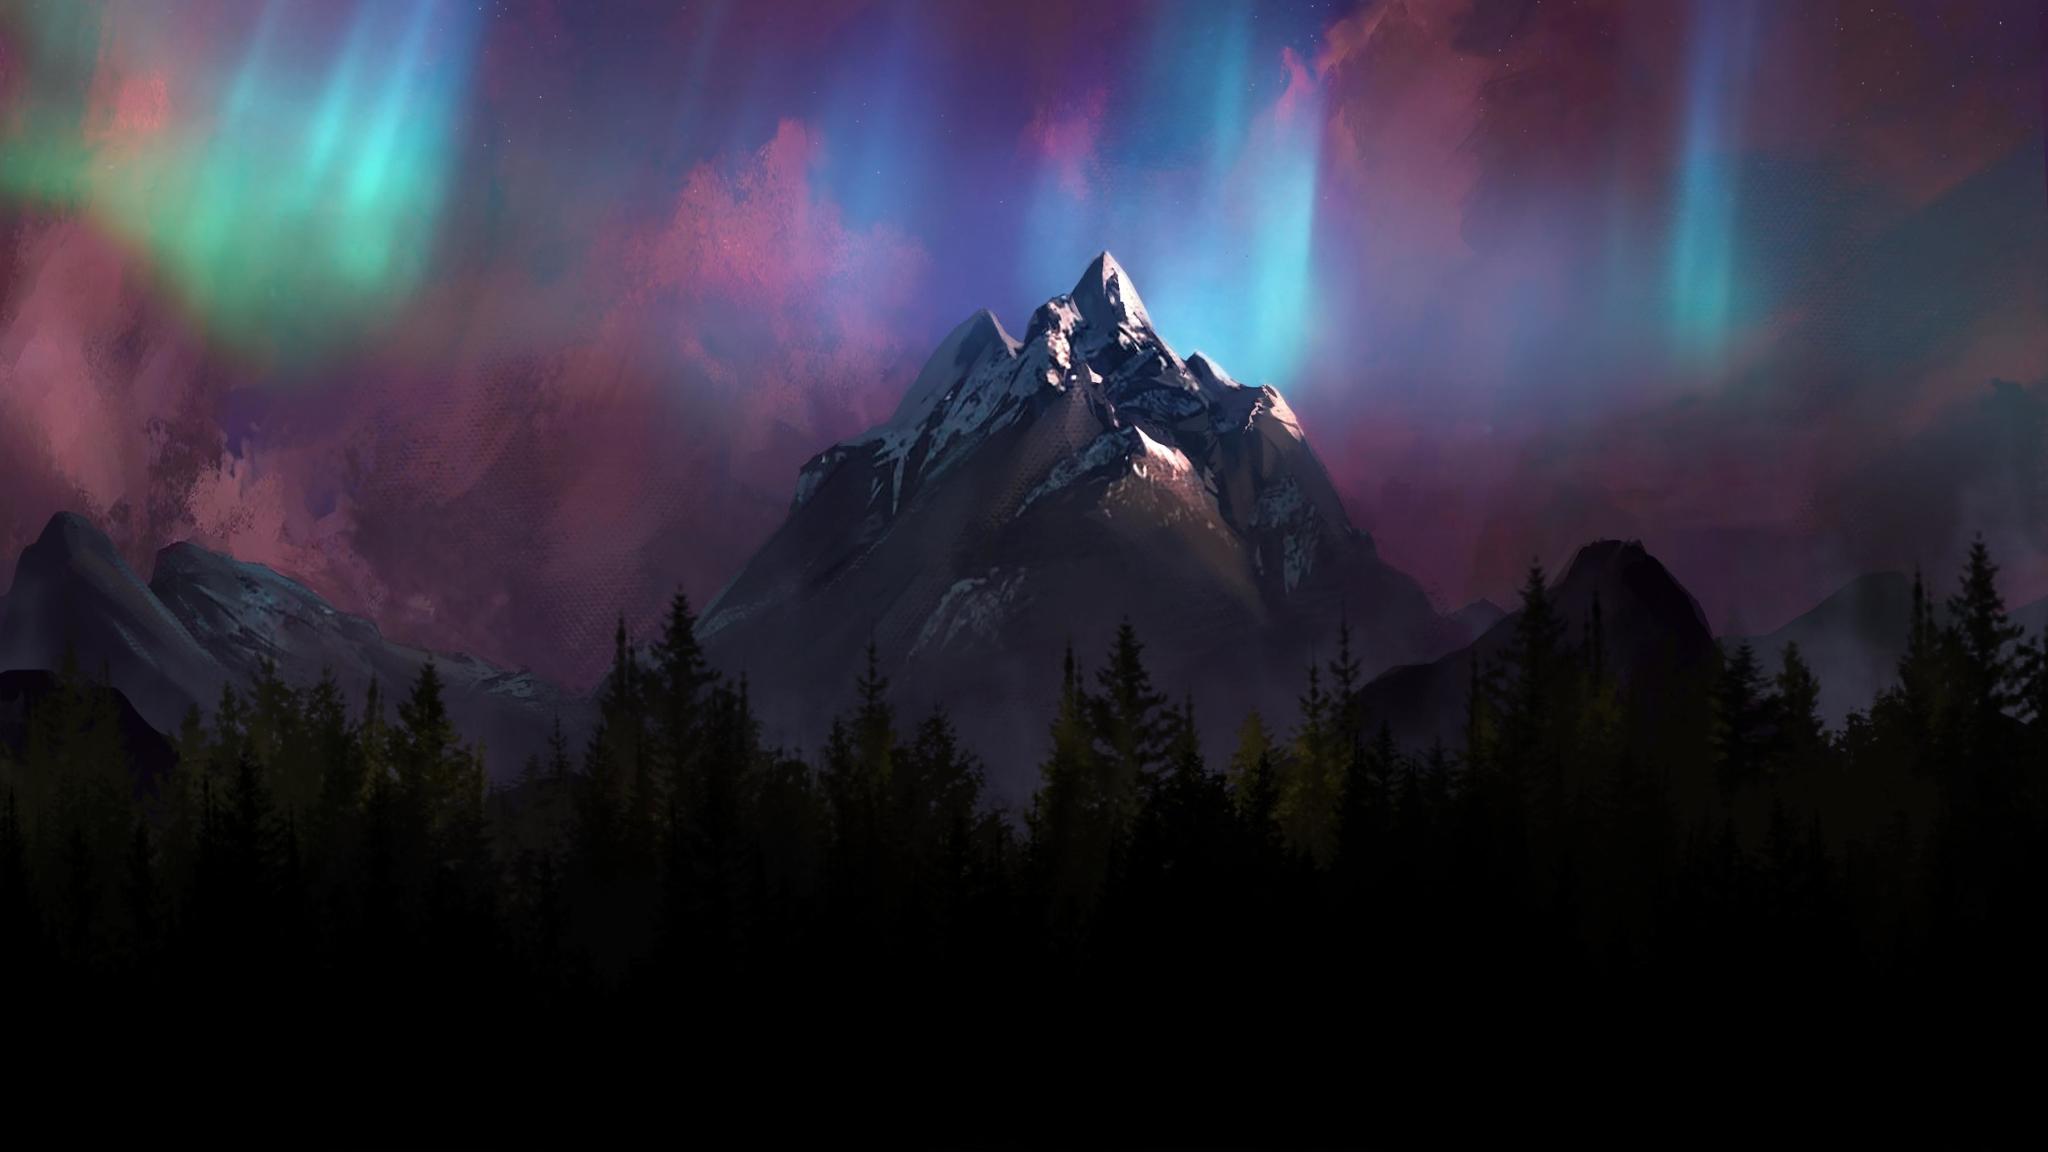 2048x1152 Mountain 2048x1152 Resolution Wallpaper Hd Nature